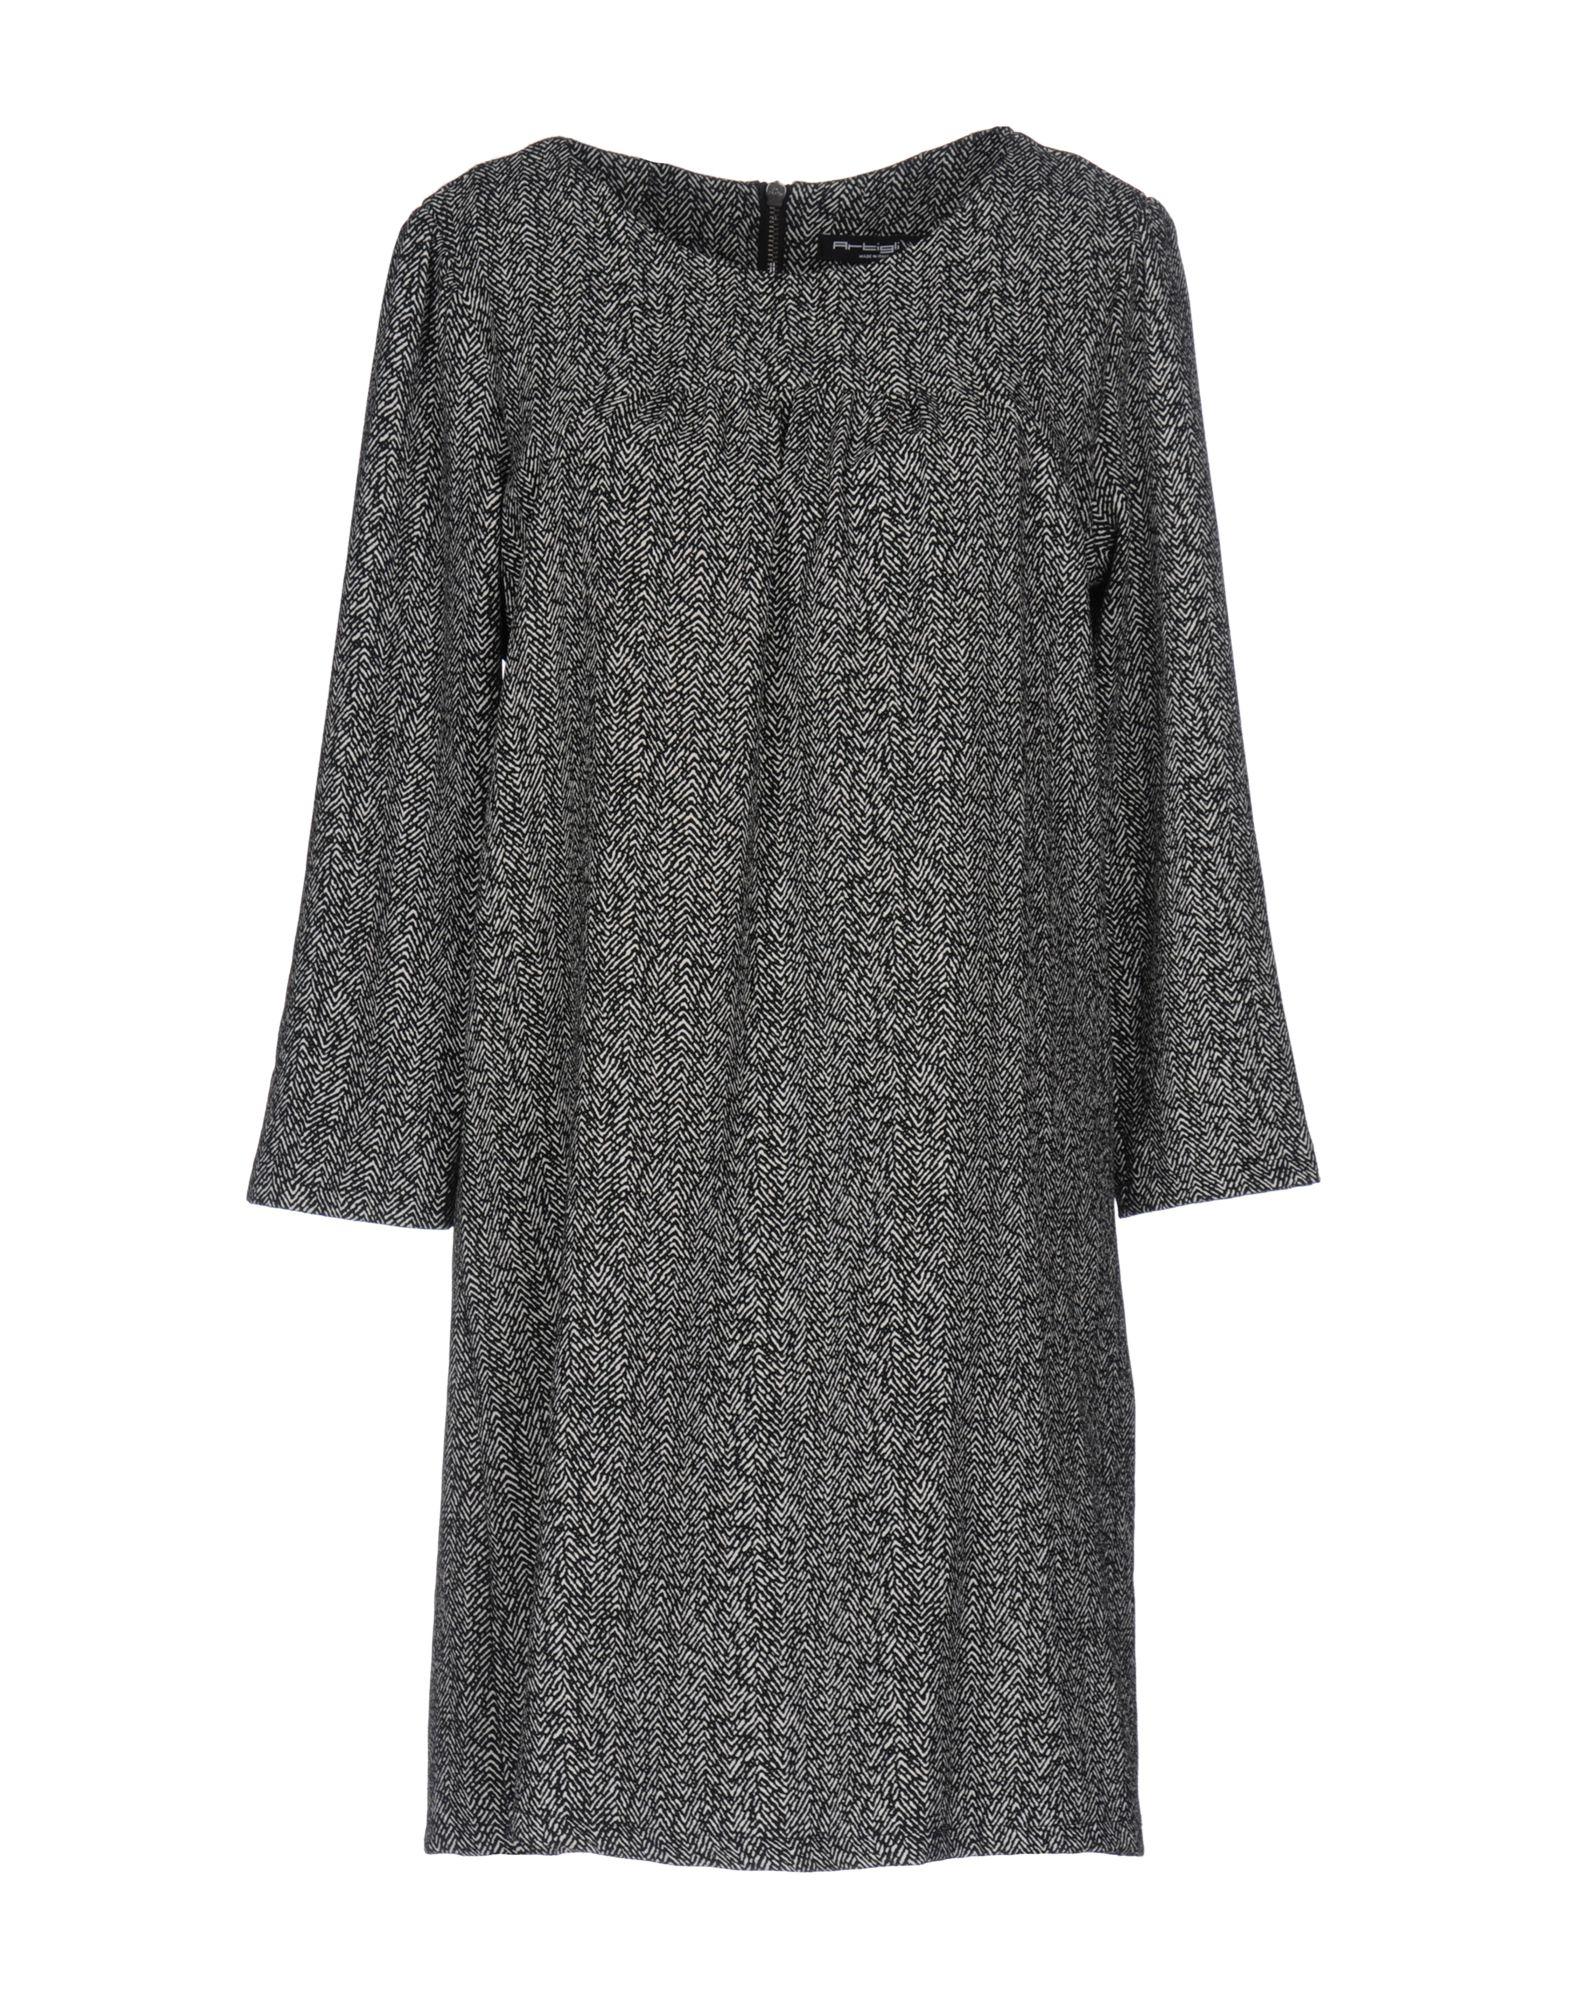 ARTIGLI Короткое платье artigli юбка для девочки a07401 серый artigli